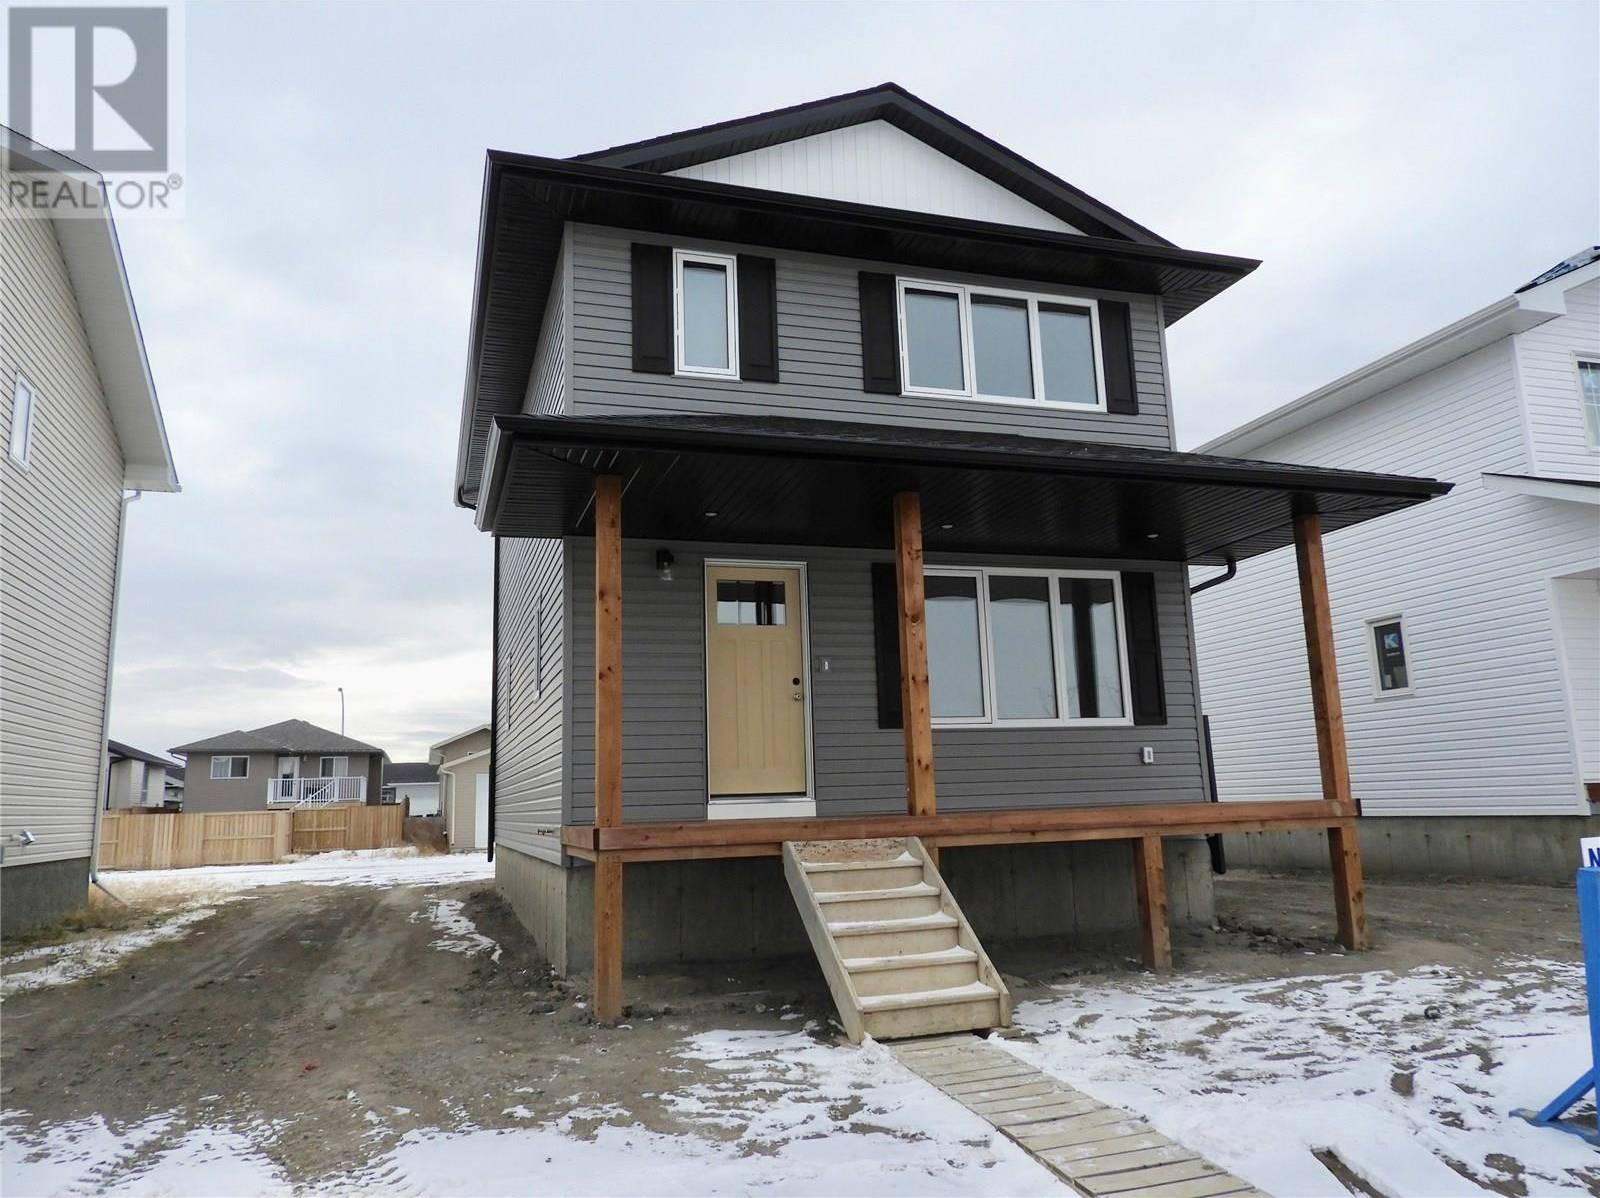 House for sale at 115 Reddekopp Cres Warman Saskatchewan - MLS: SK791111